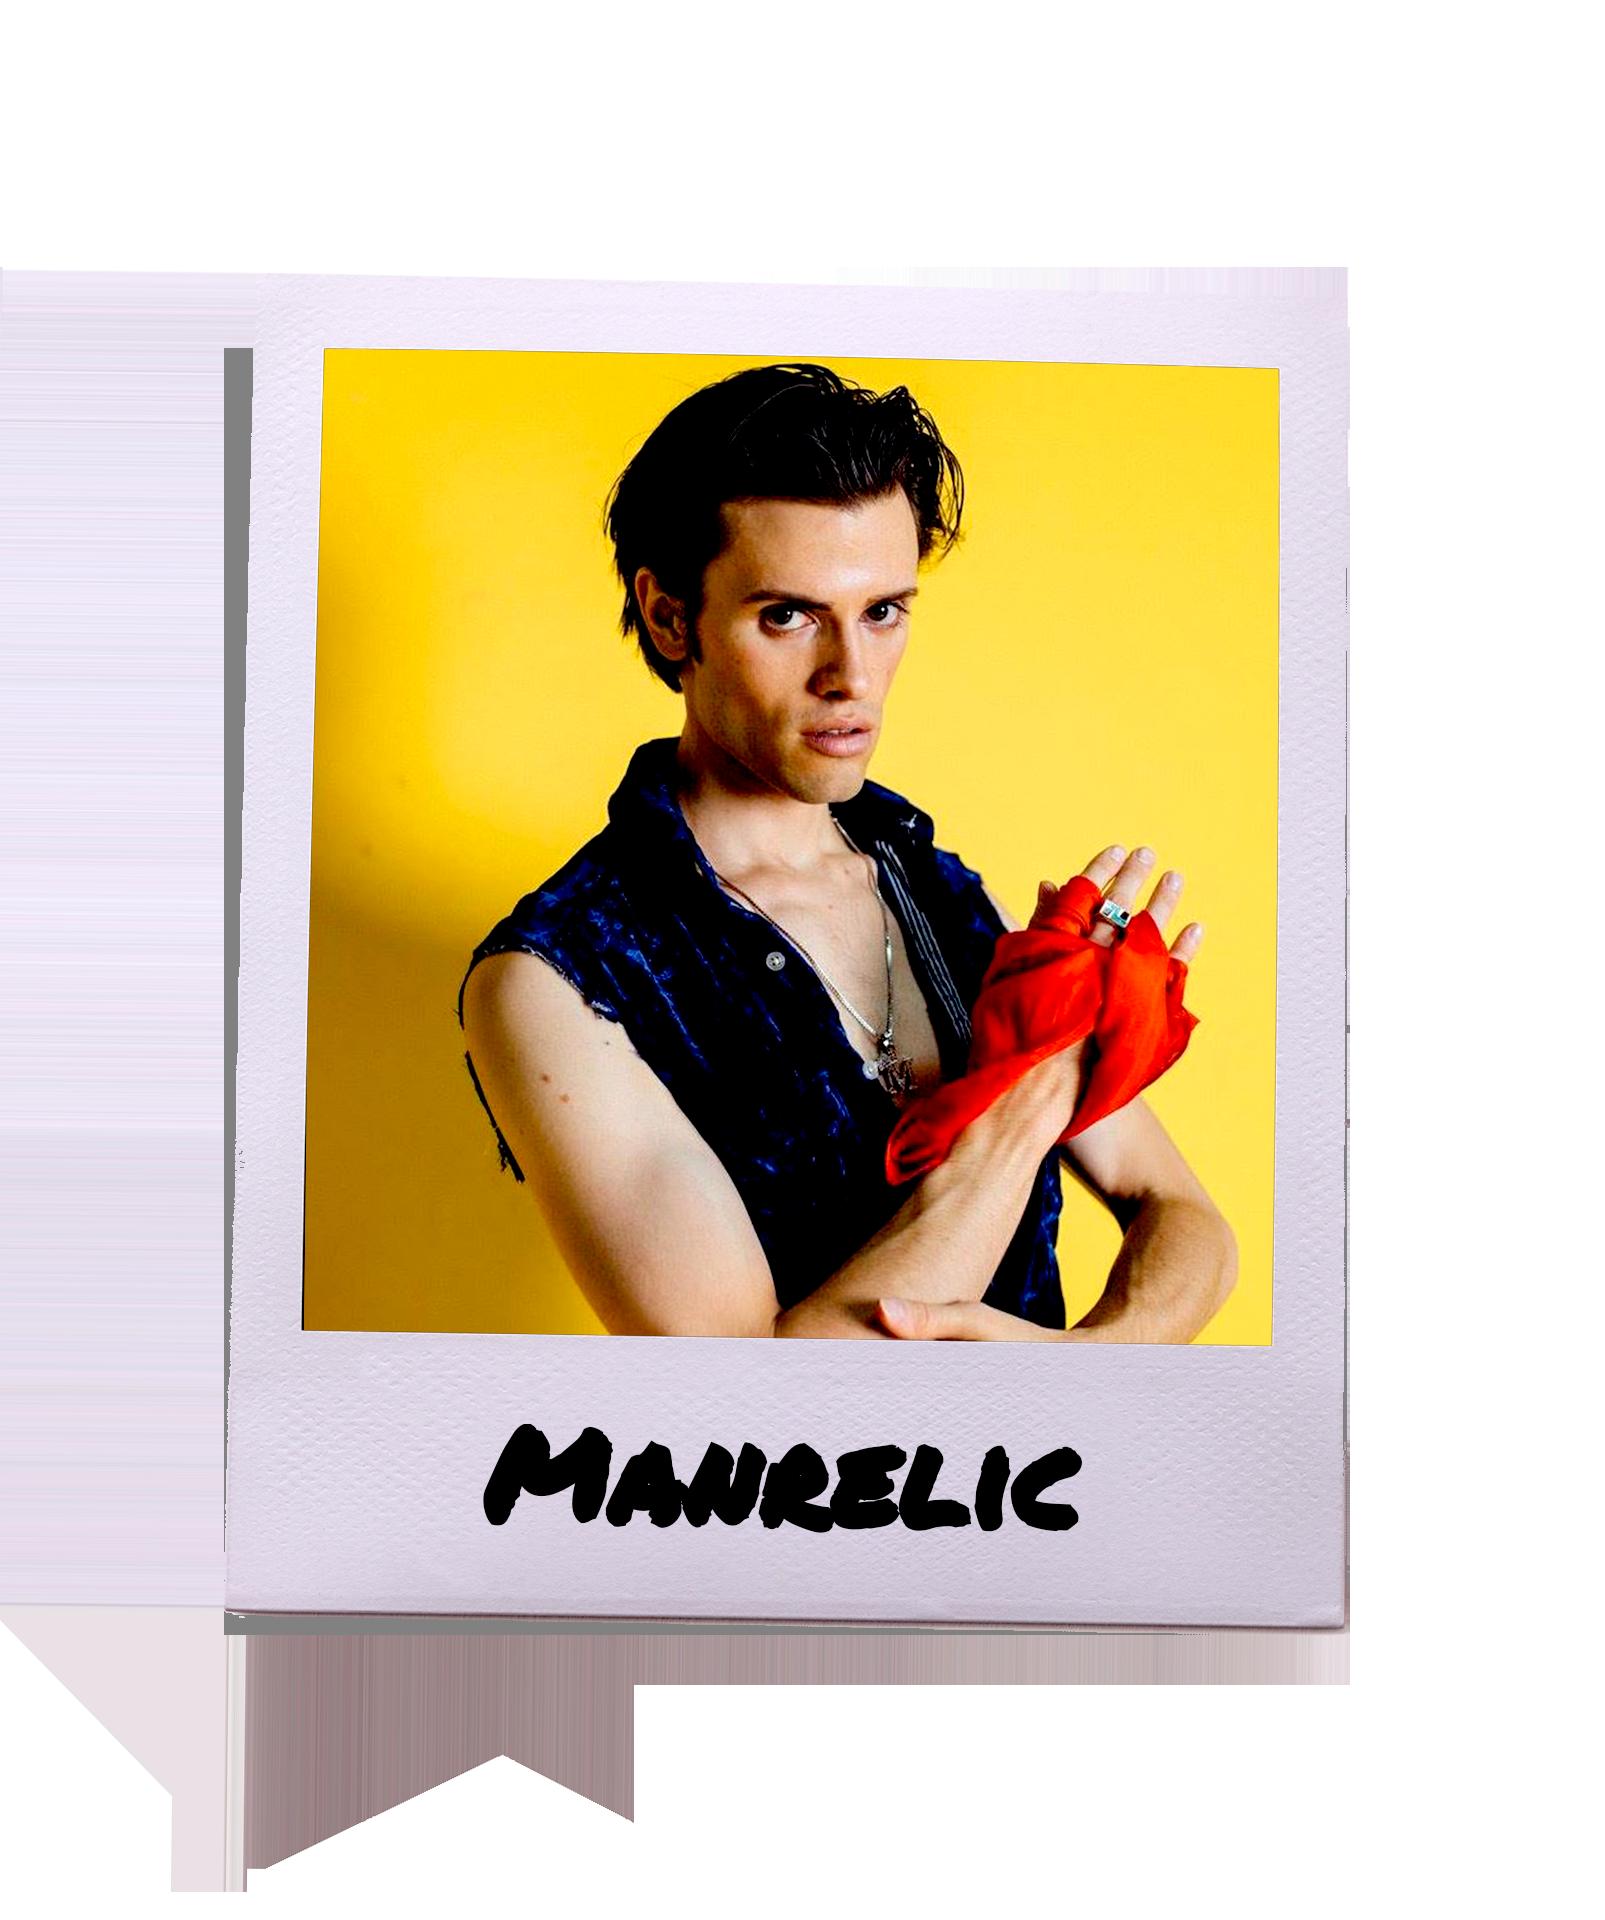 Single-polaroid_bands_Manrelic.png